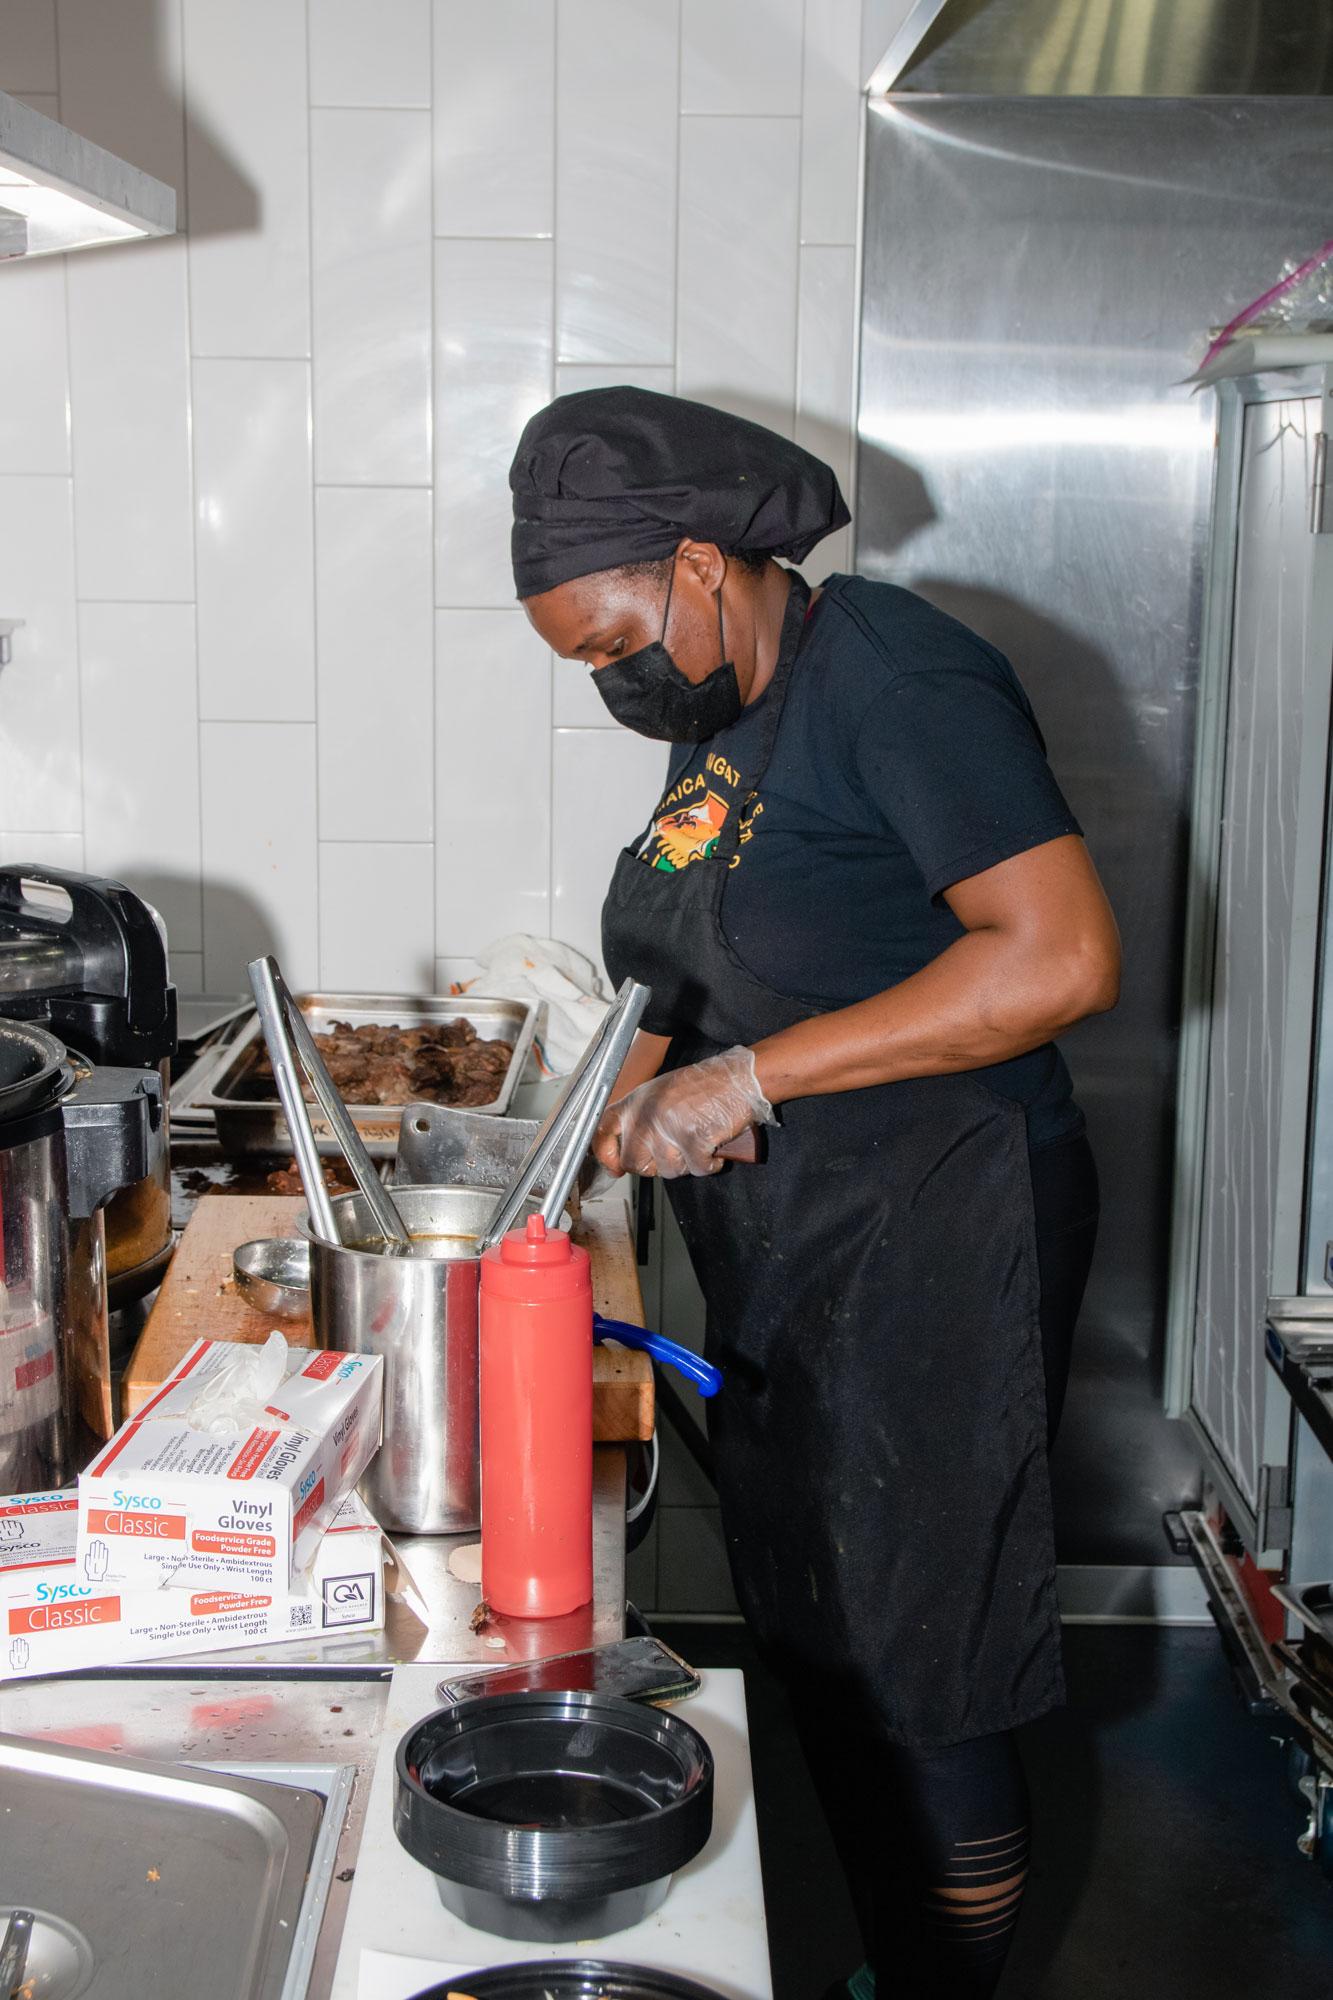 Latoya chopping meat in her kitchen.